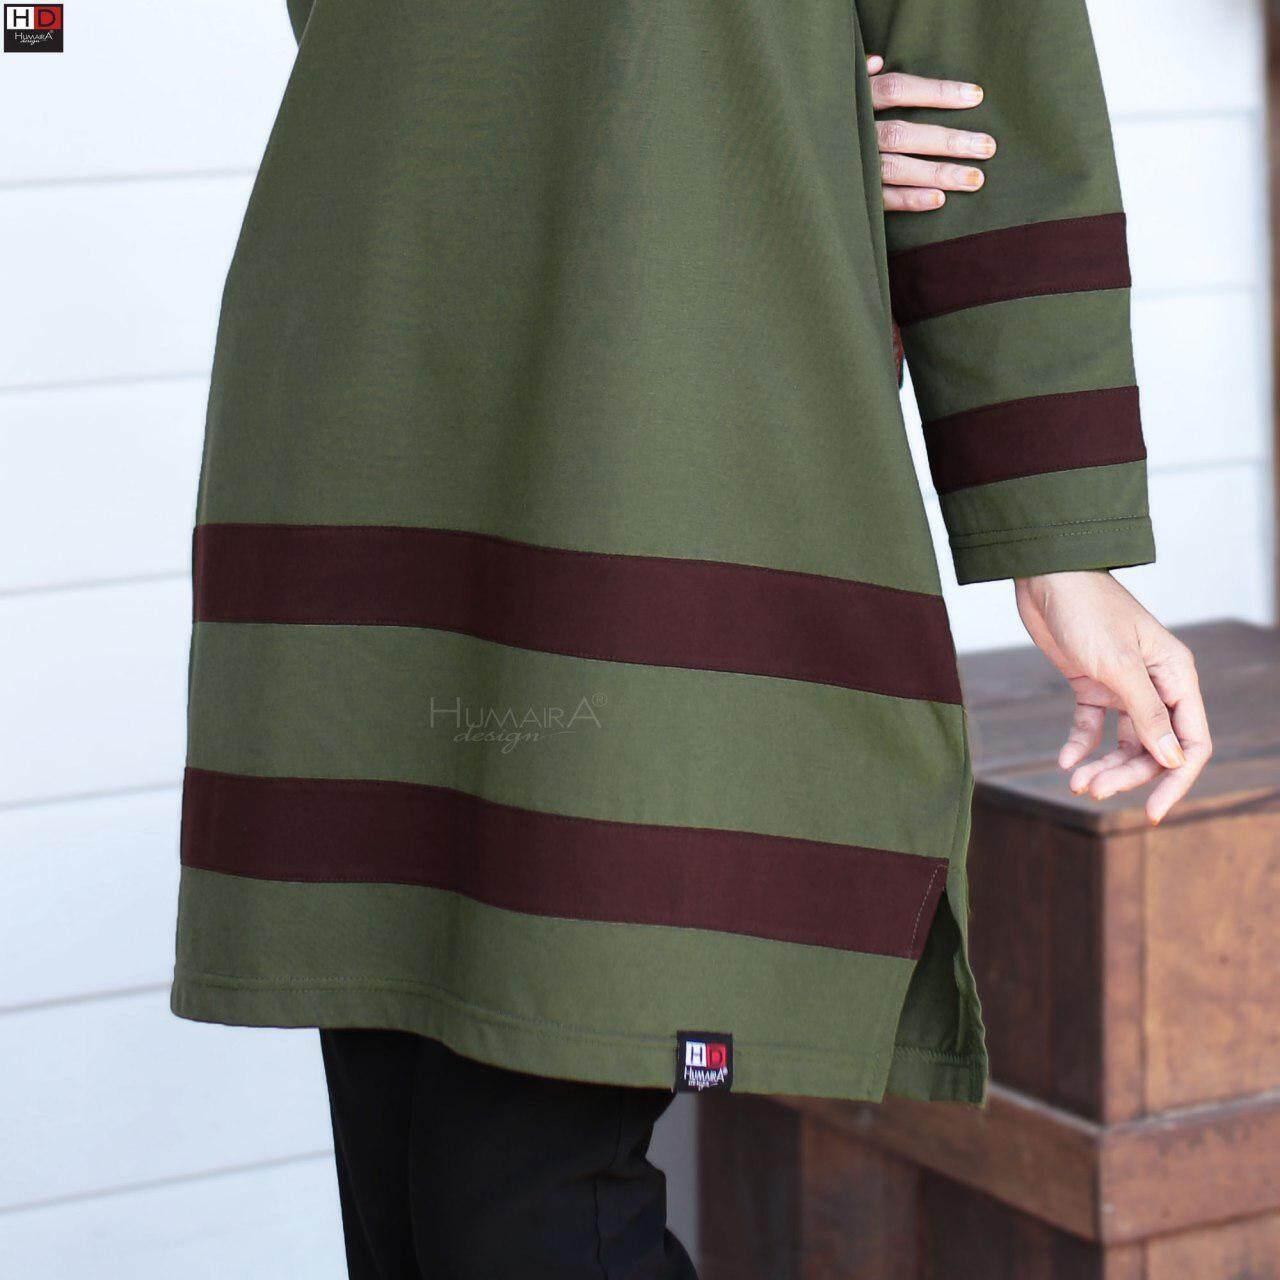 Muslim Wear For Women With Best Price At Lazada Malaysia Dress Putih Renda A30554 Tops